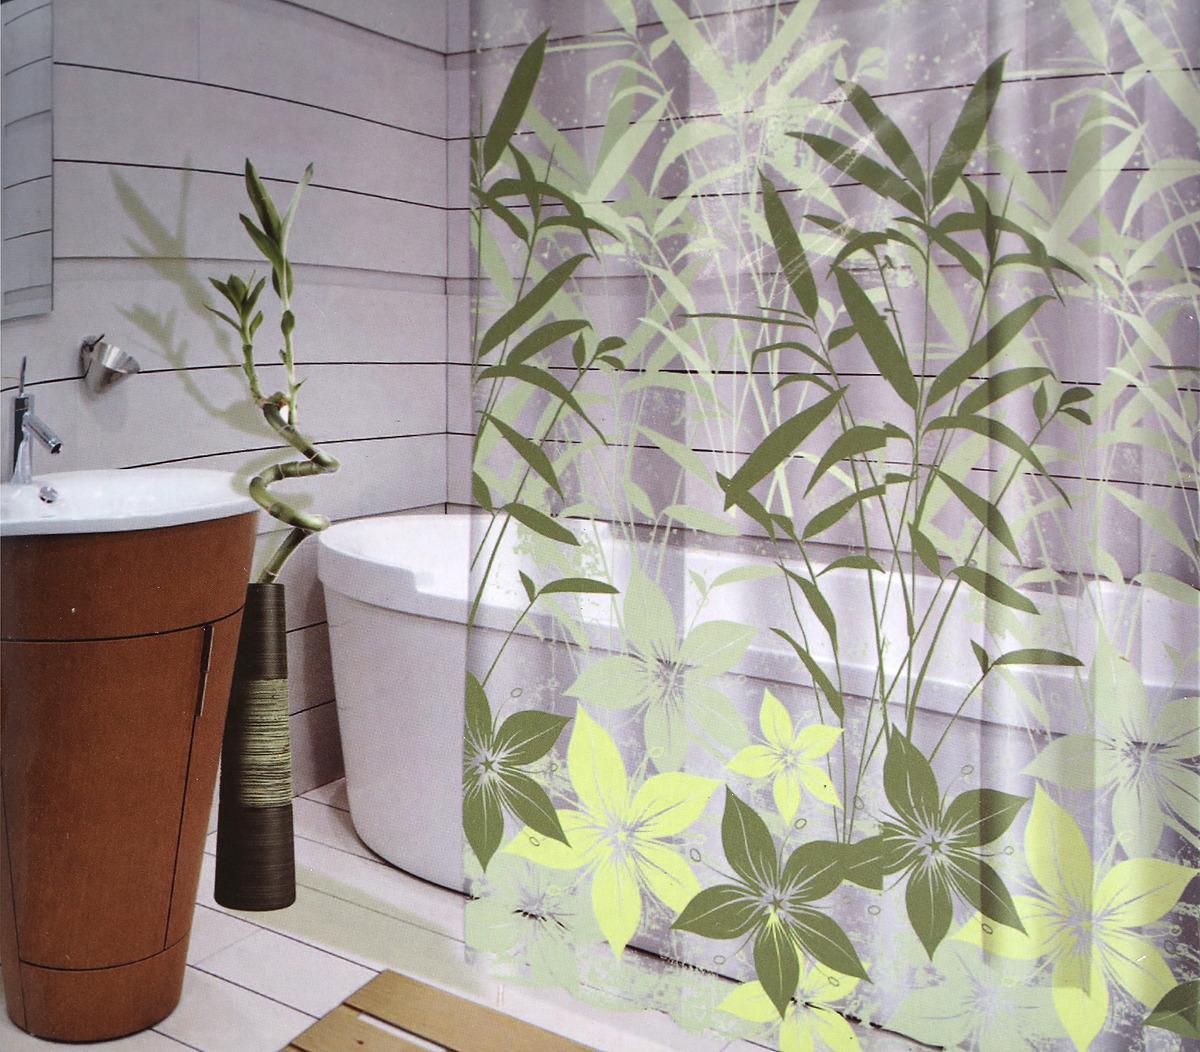 Штора для ванной Swensa Grass, цвет: зеленый, 180 х 180 см штора для ванной swensa бамбук цвет зеленый 180 х 180 см